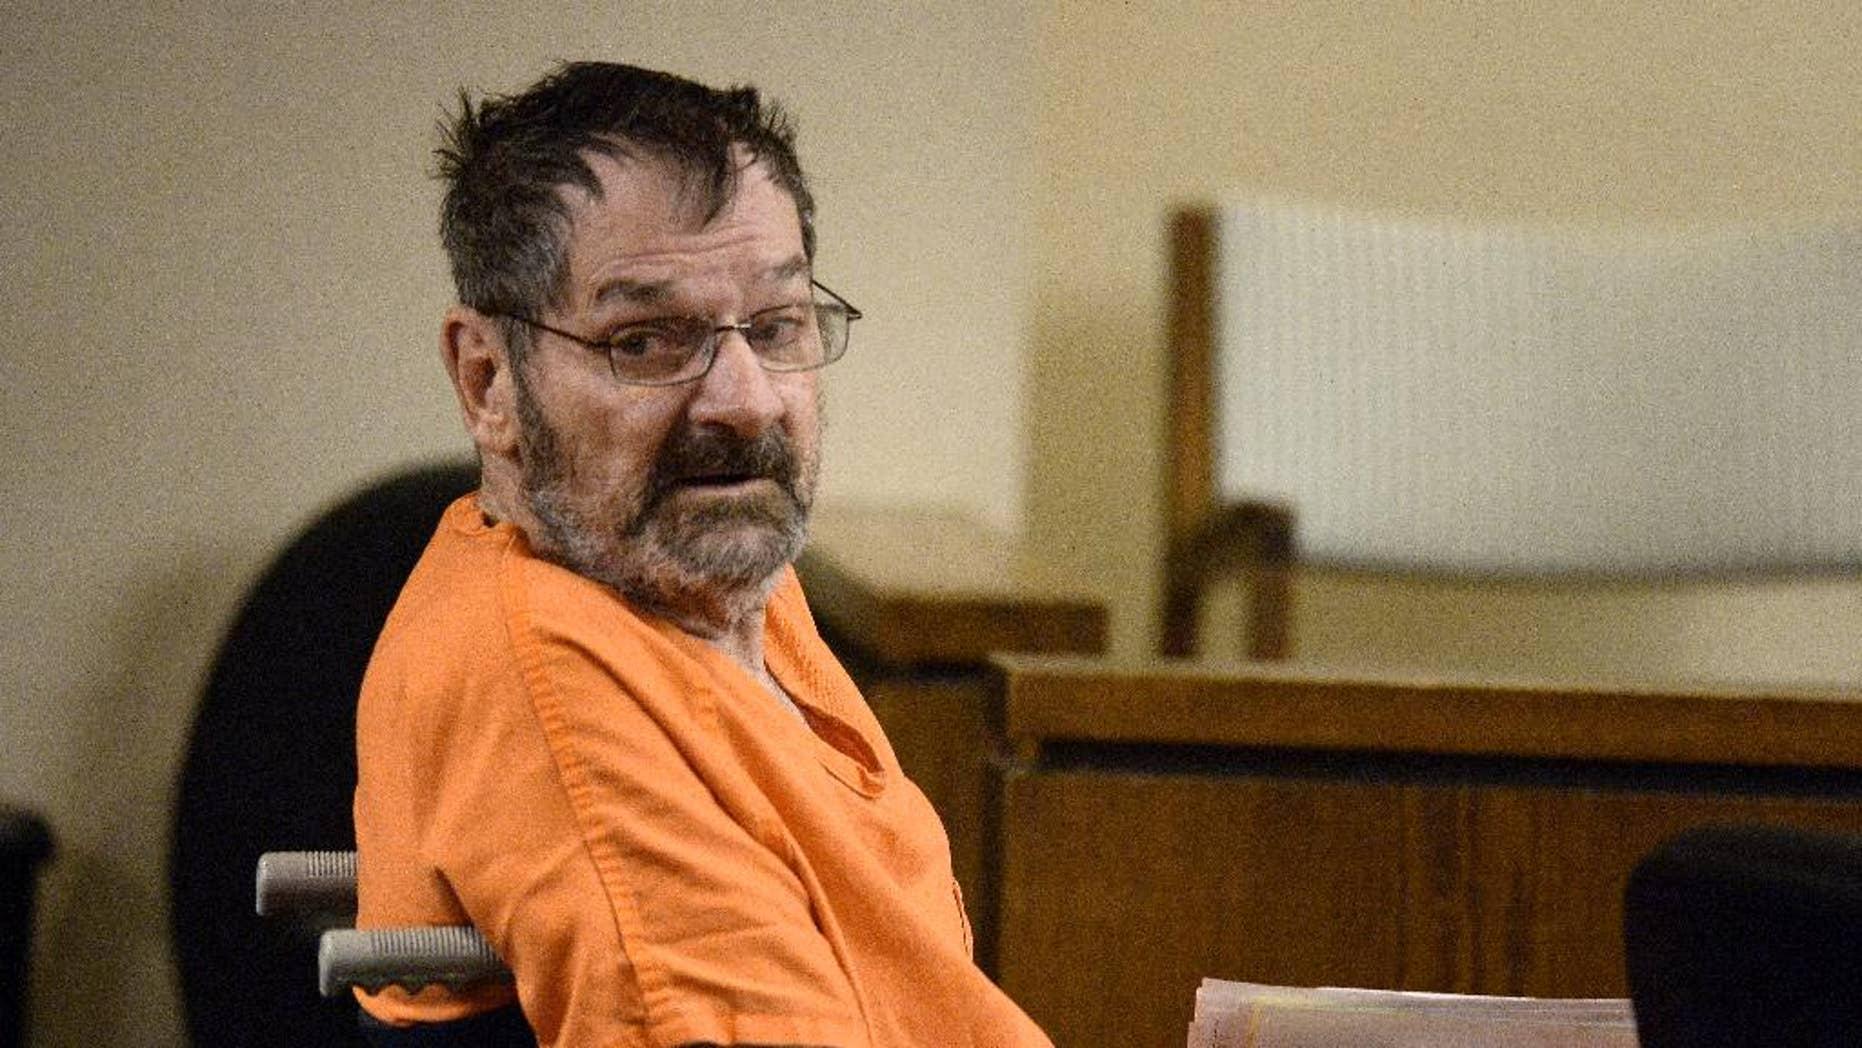 April 24, 2014: Frazier Glenn Cross, who is also known as Frazier Glenn Miller, looks around after being wheeled into court in Olathe, Kan. (AP/The Kansas City Star, John Sleezer)